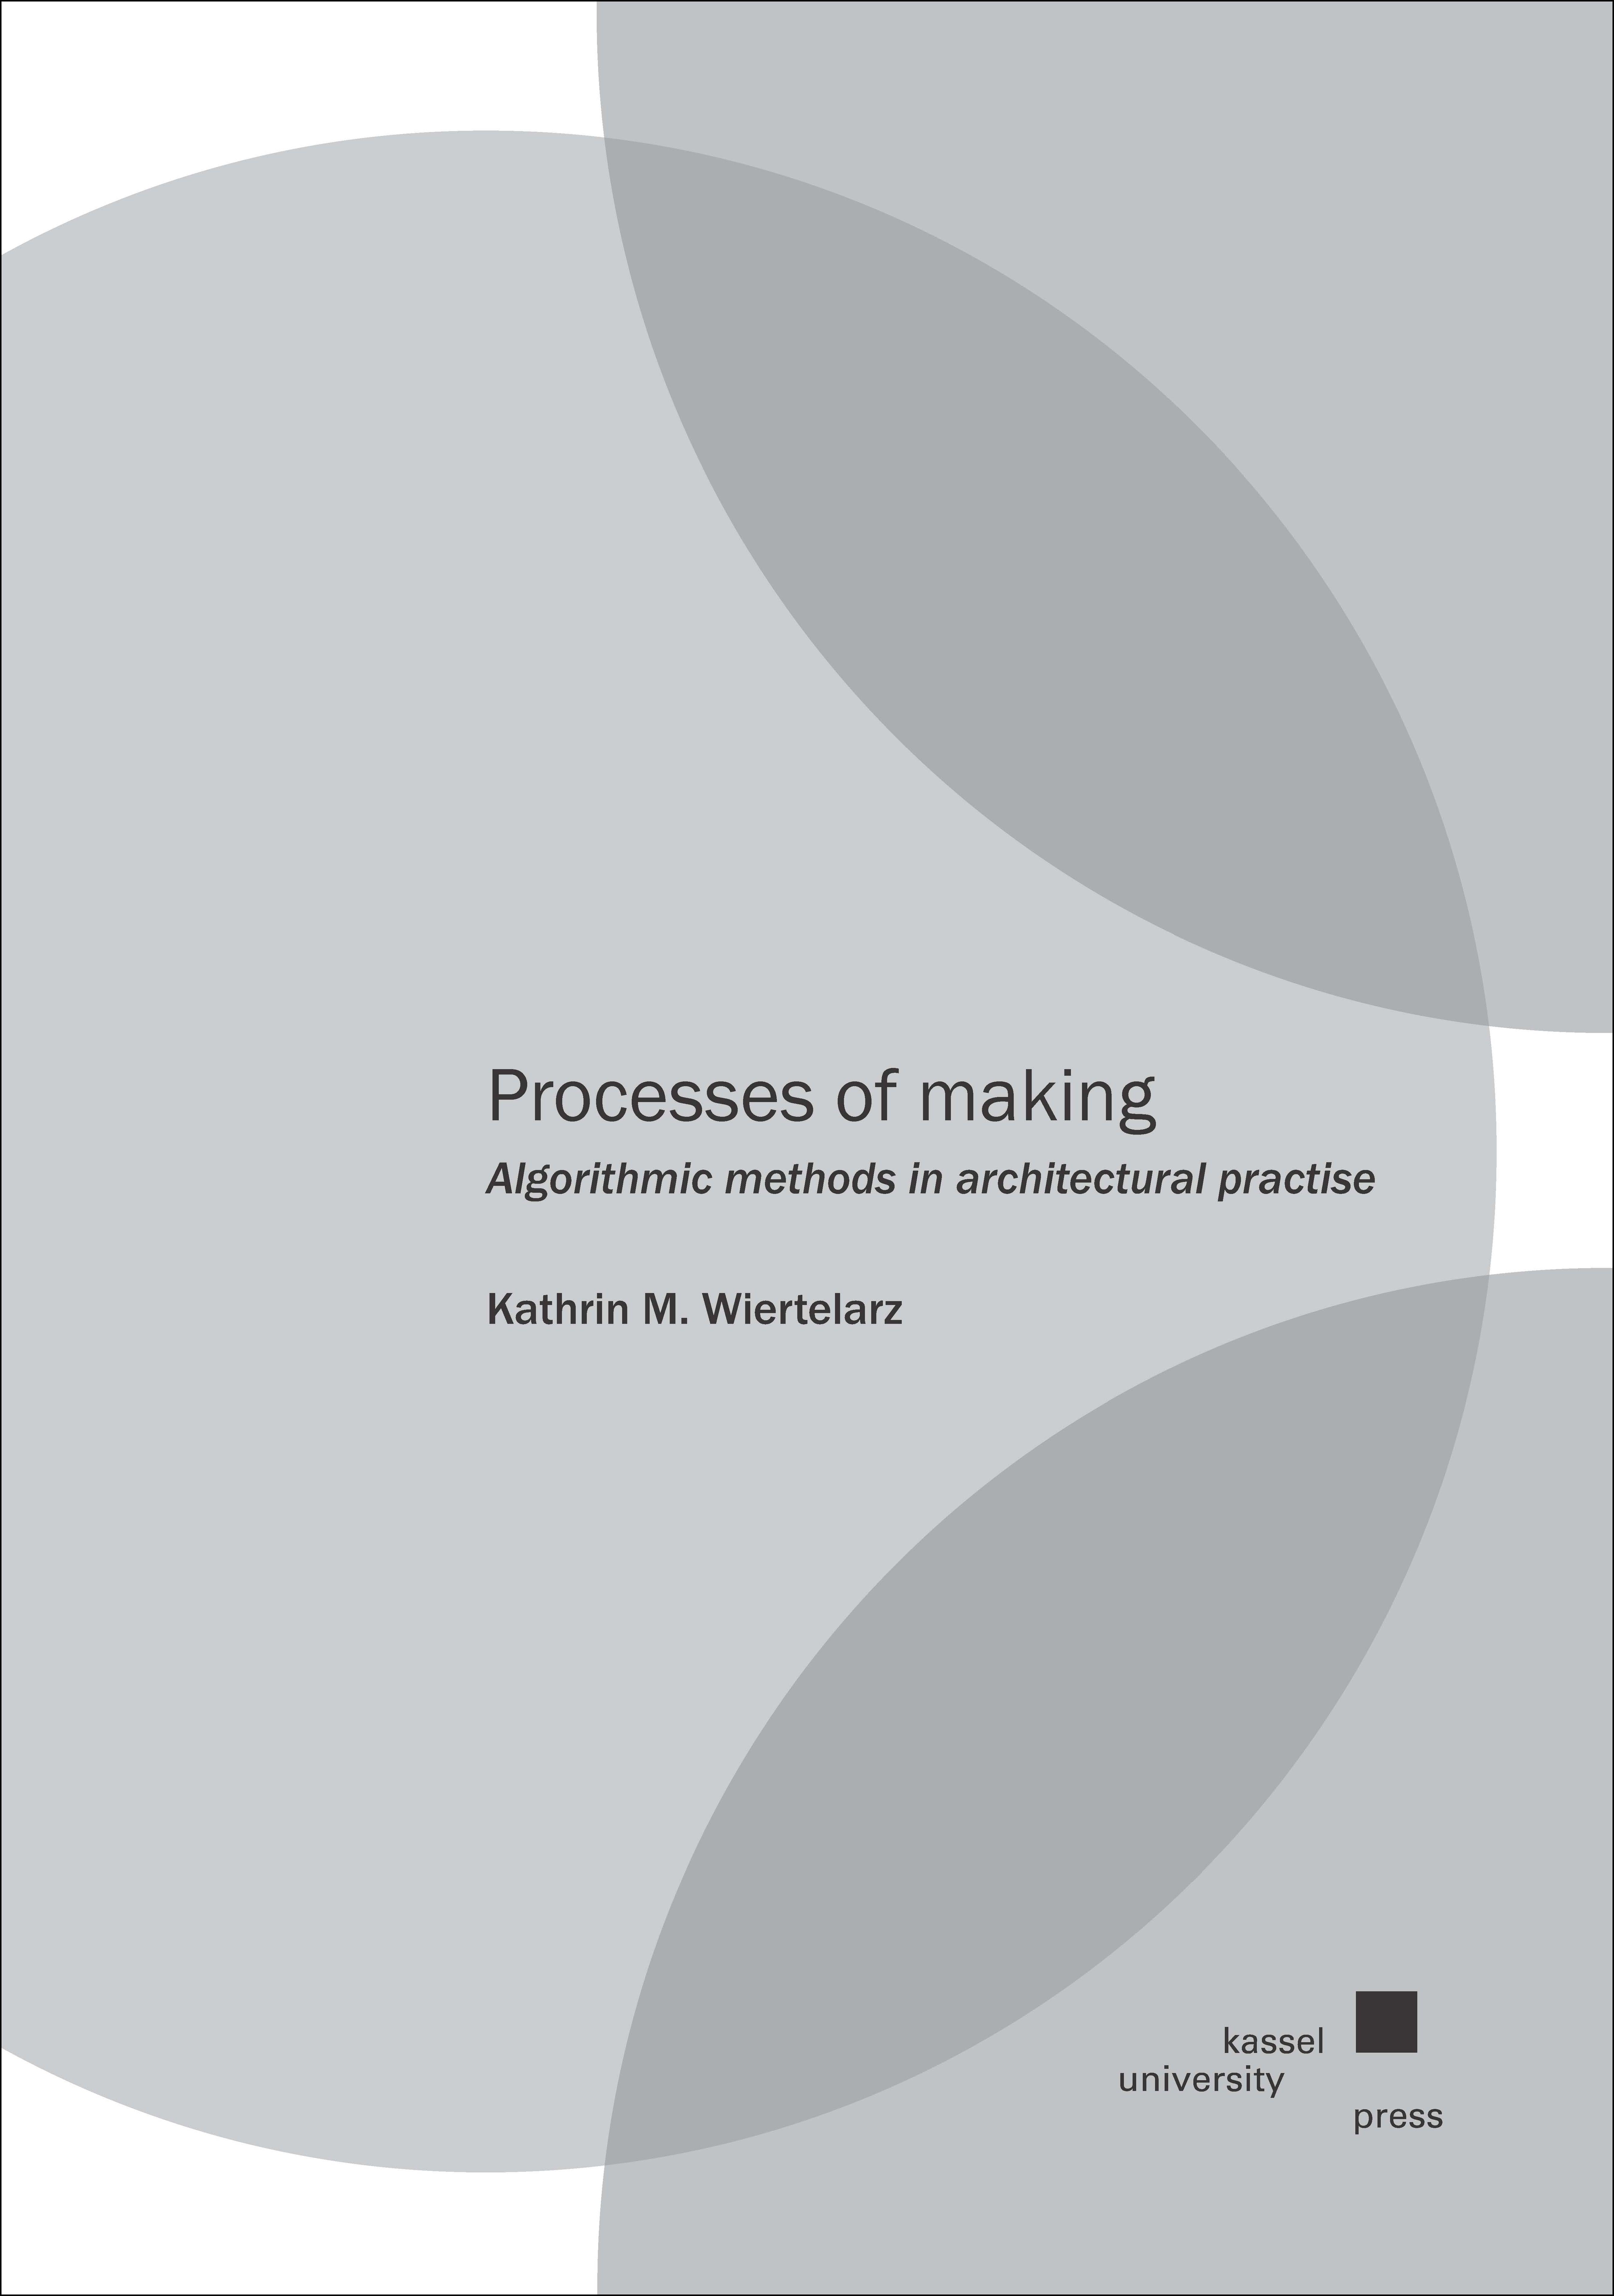 Processes of making Kathrin M. Wiertelarz